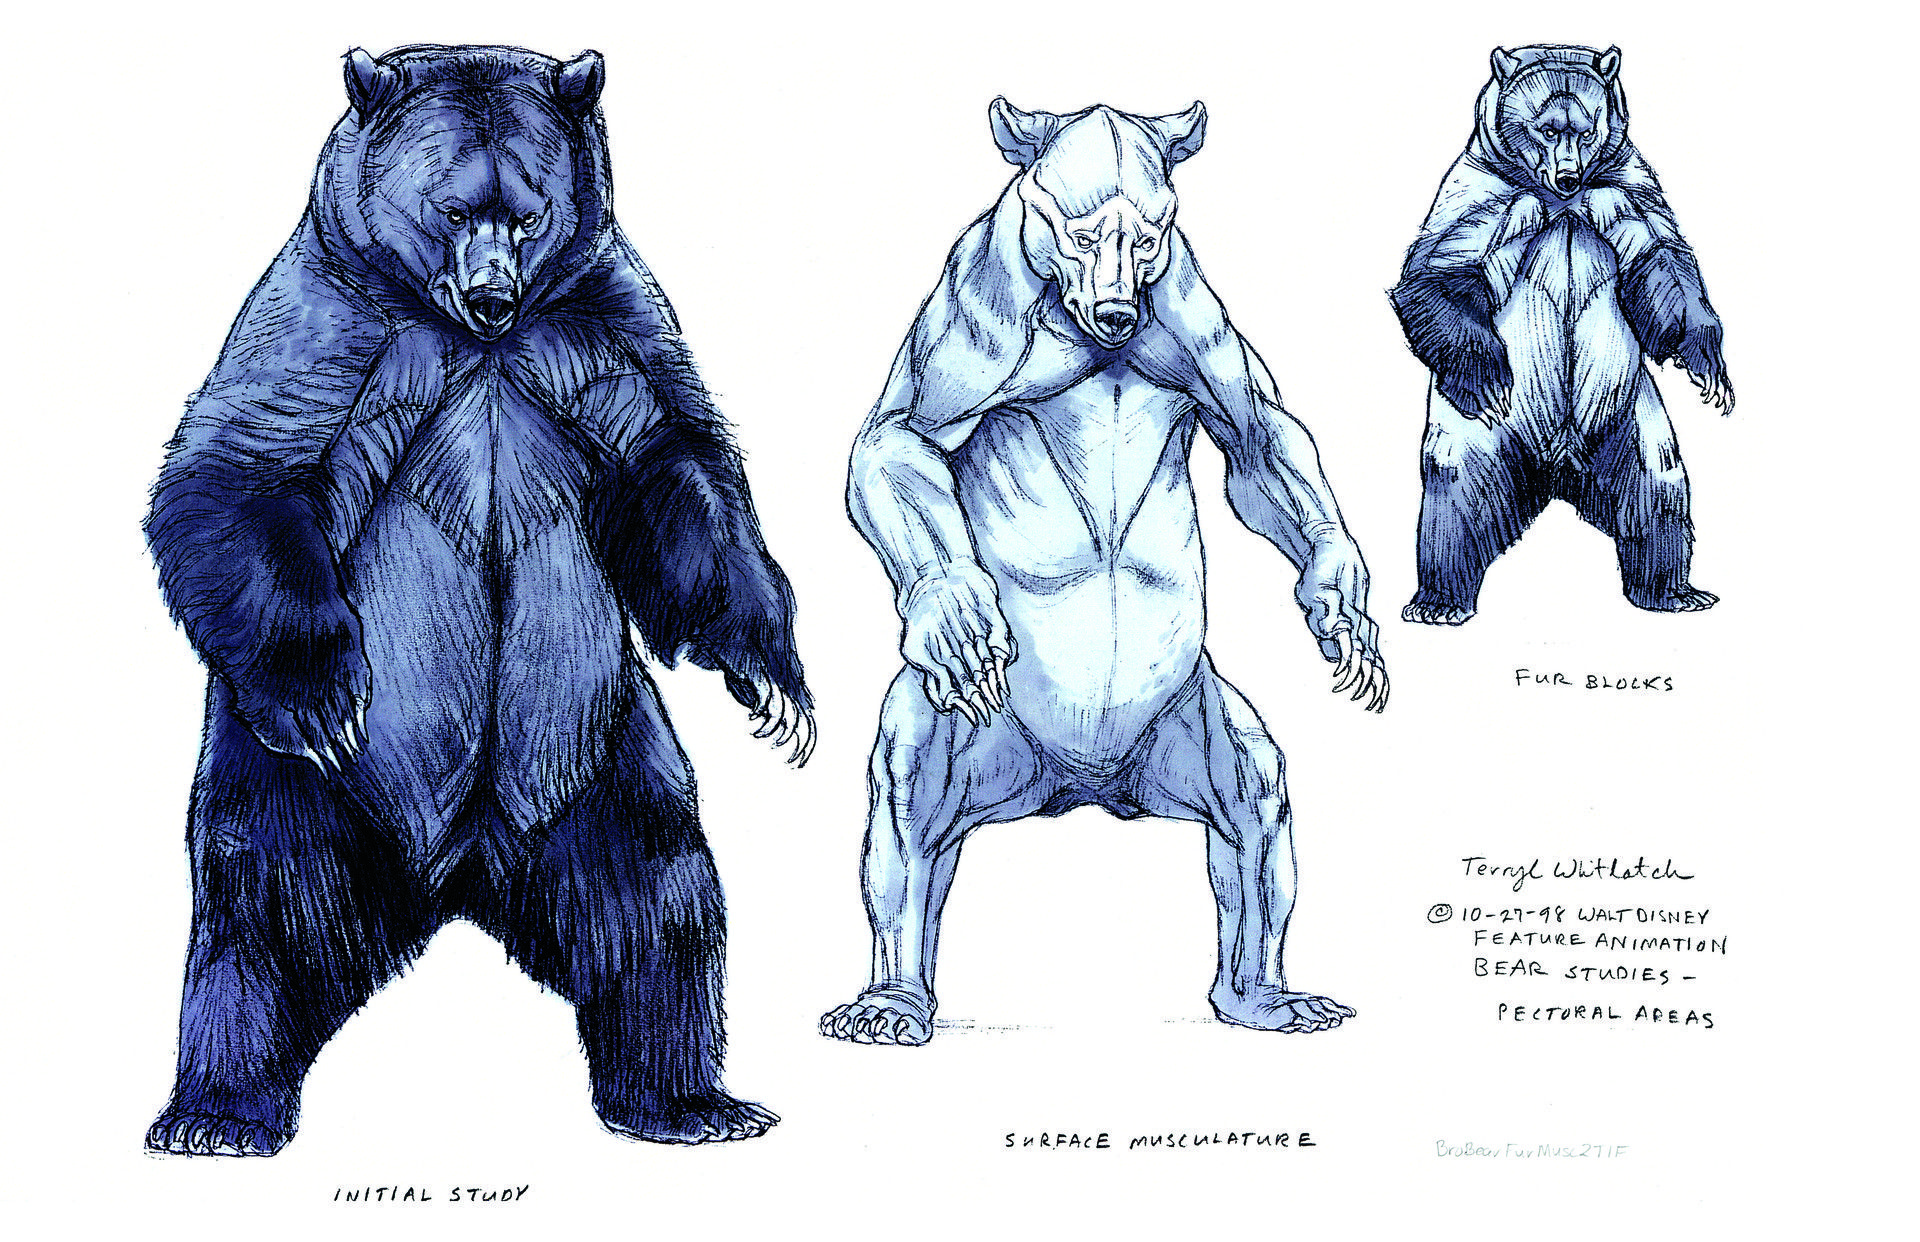 ArtStation - Brother Bear Concept Art, Terryl Whitlatch | Monstrum ...